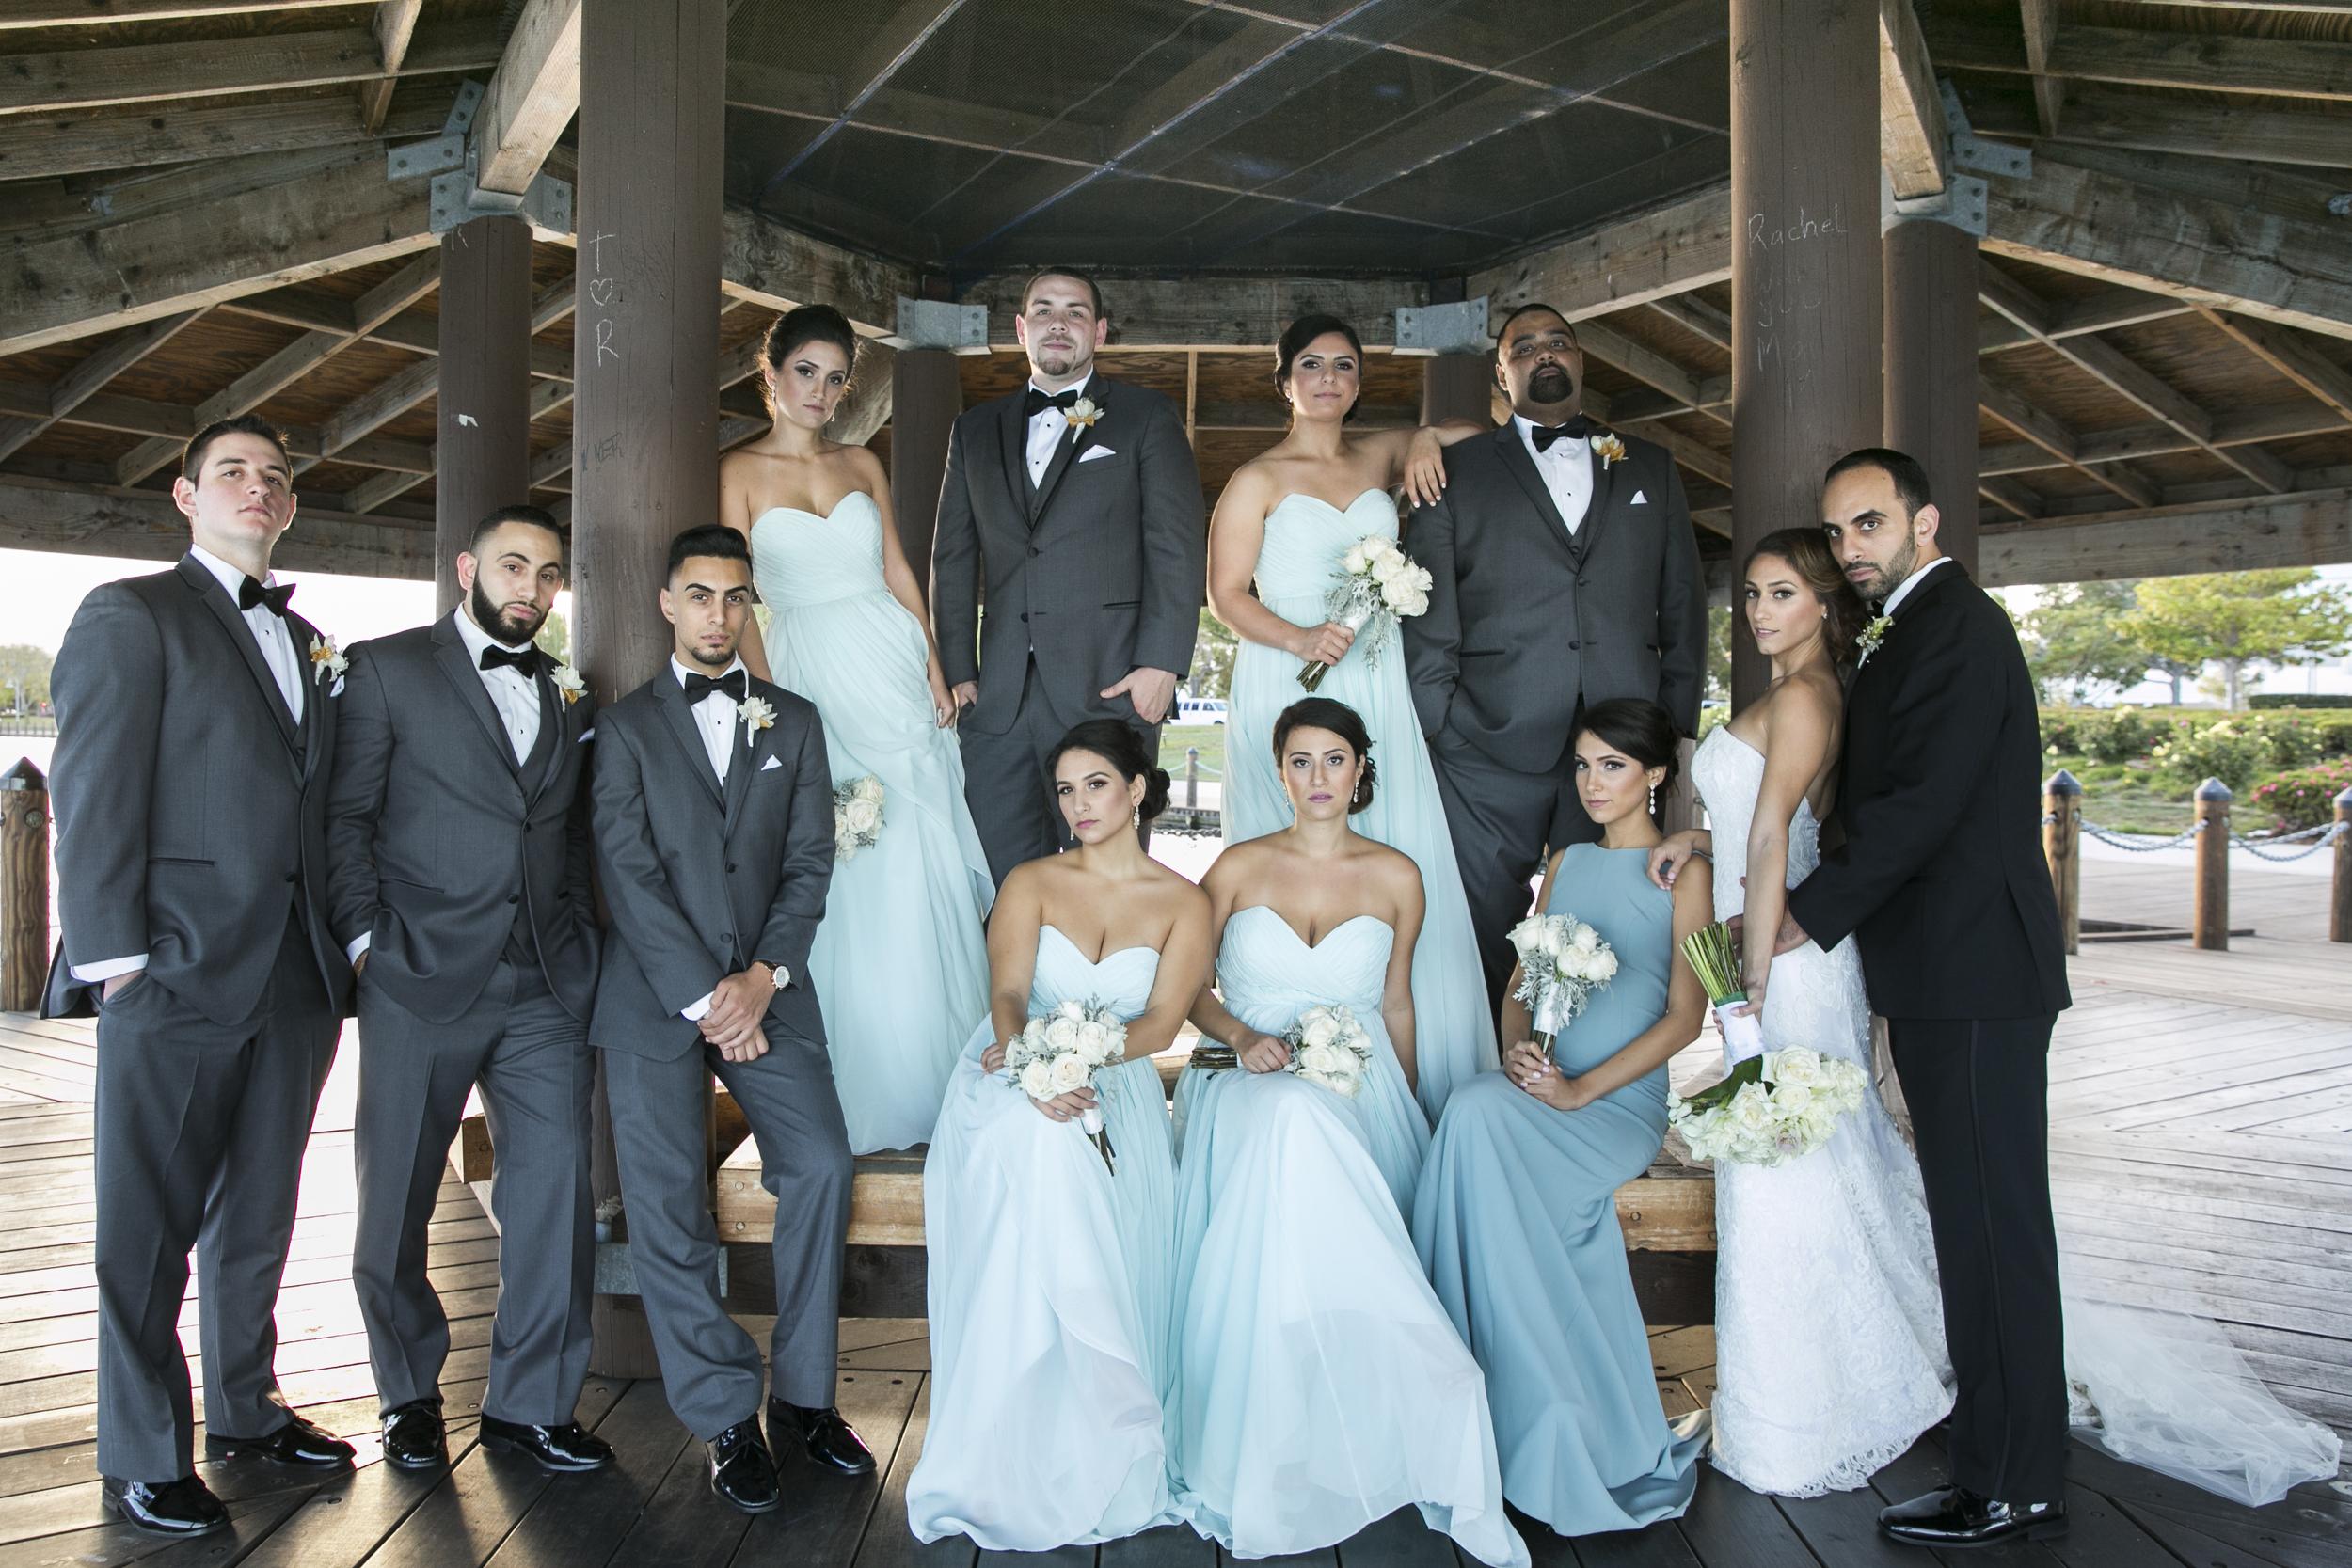 Persian Wedding-South San Francisco-Meo Baaklini22.jpg